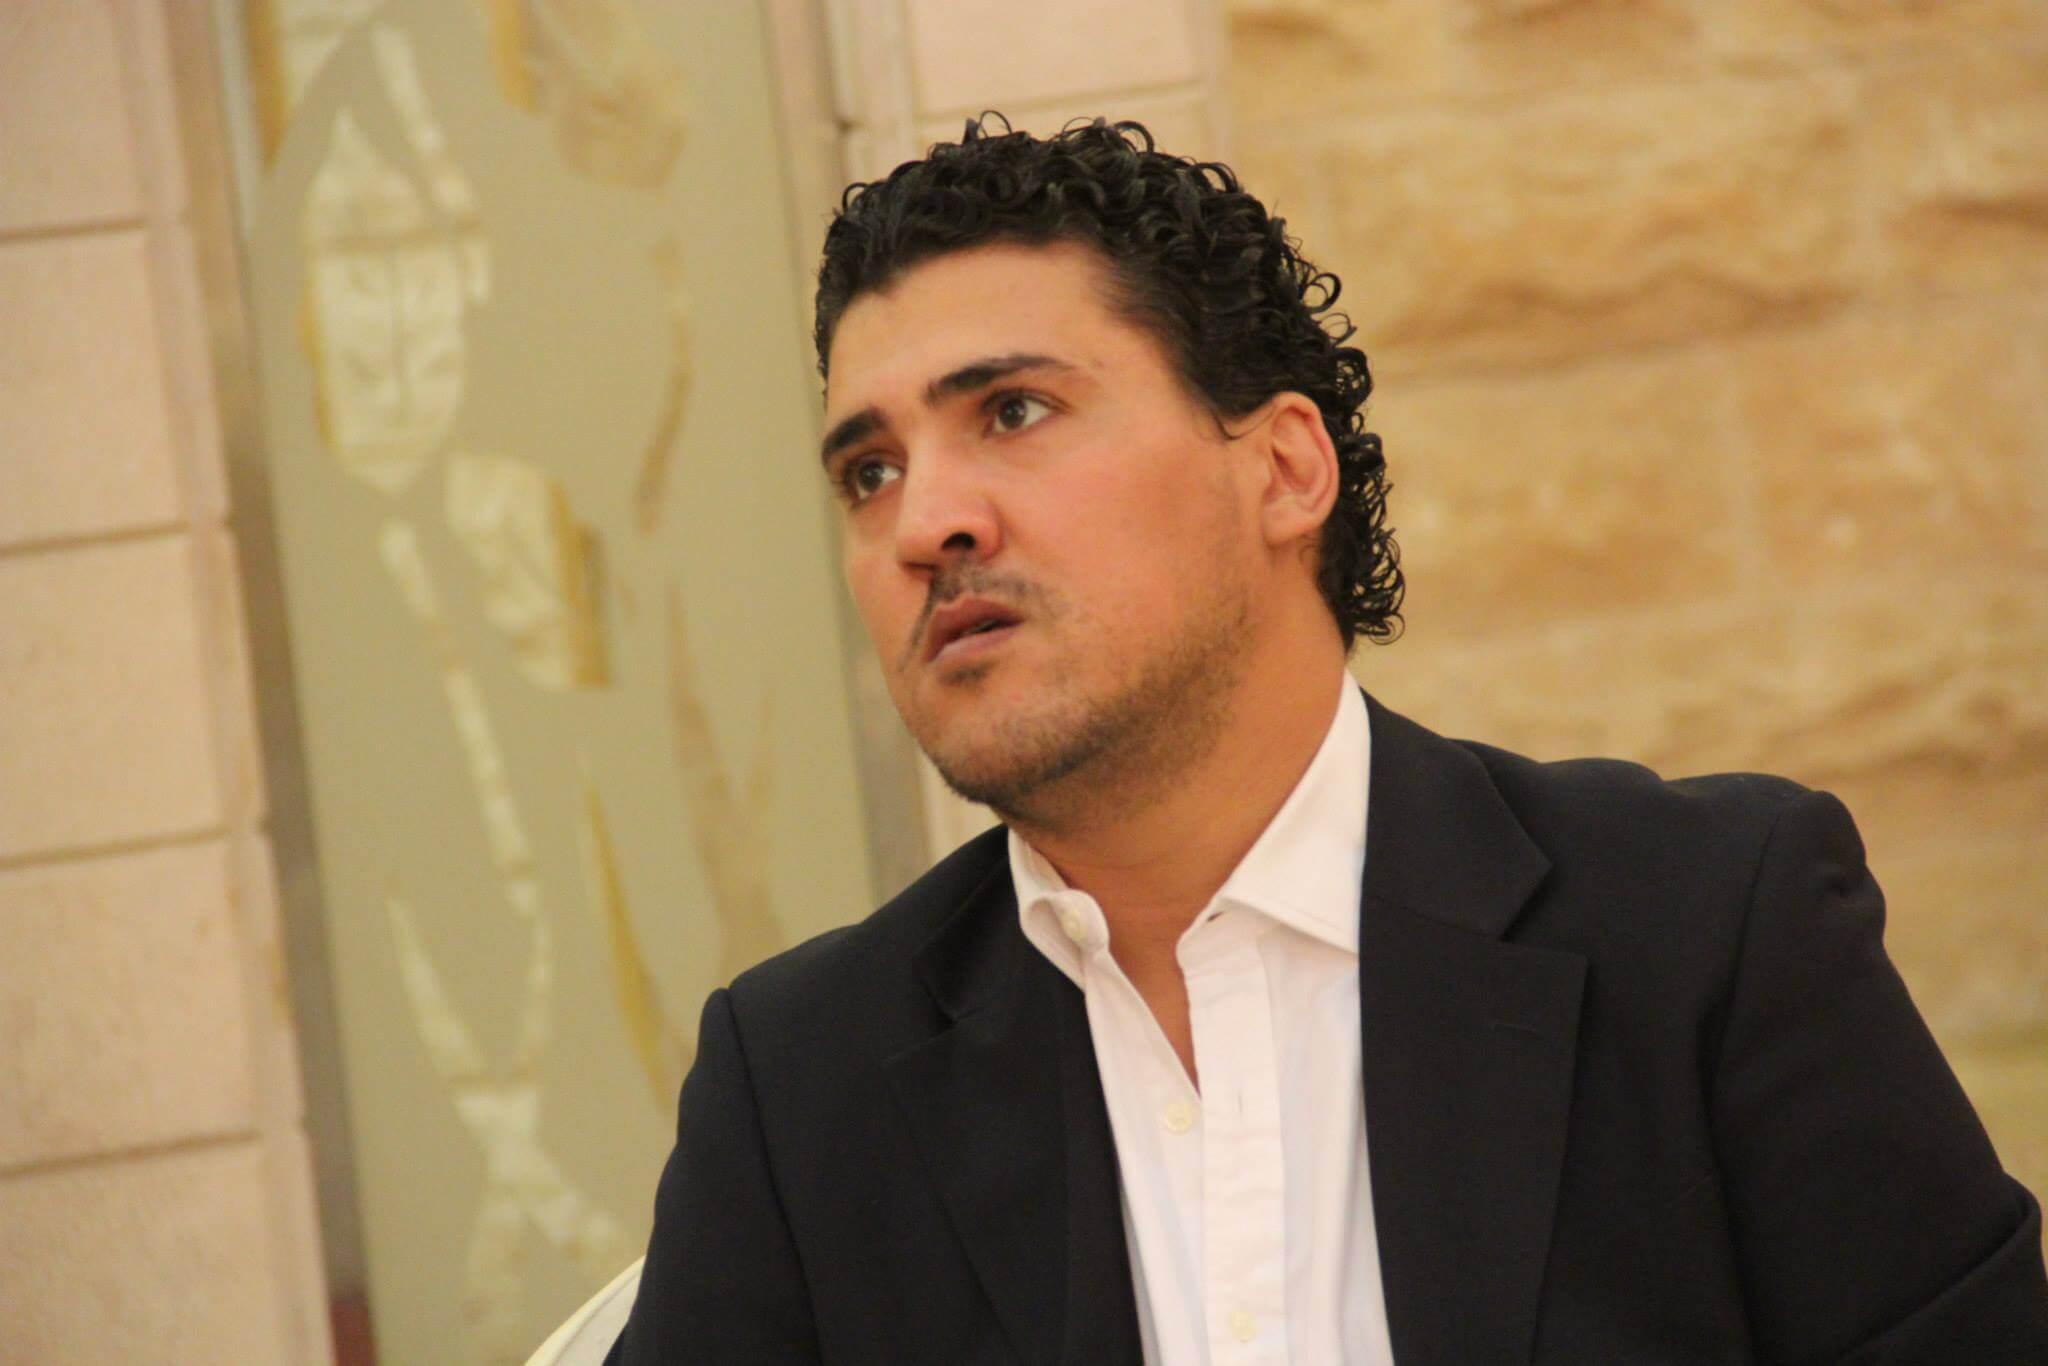 Moe Saadeh